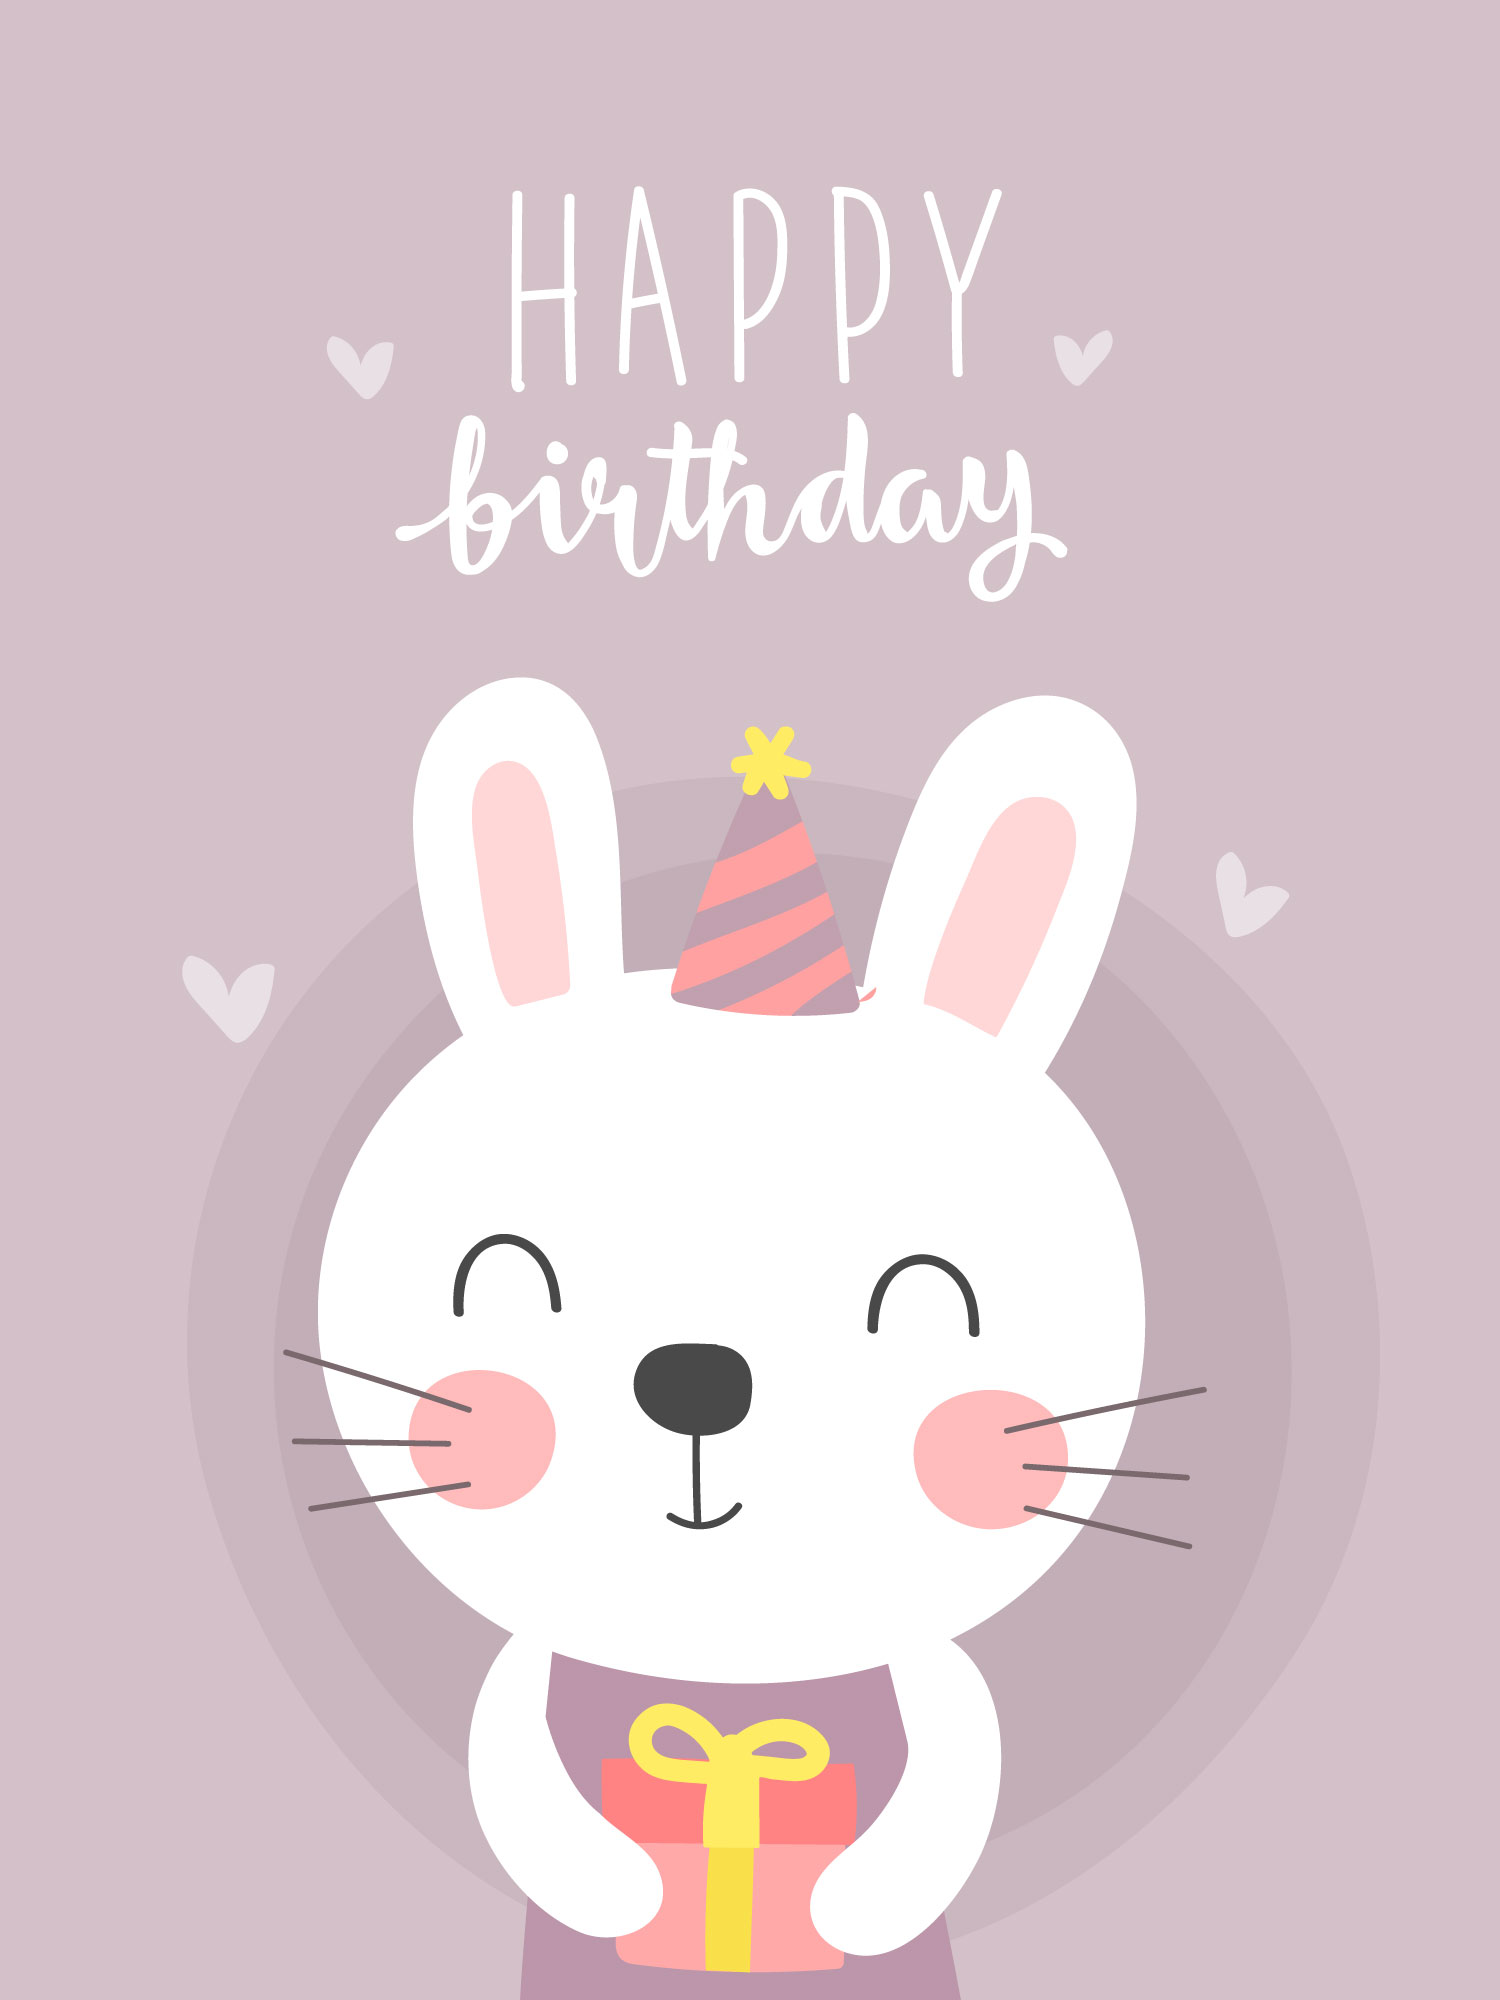 Cute Bunny Birthday Greeting Card 559029 Vector Art at ... (1500 x 2000 Pixel)